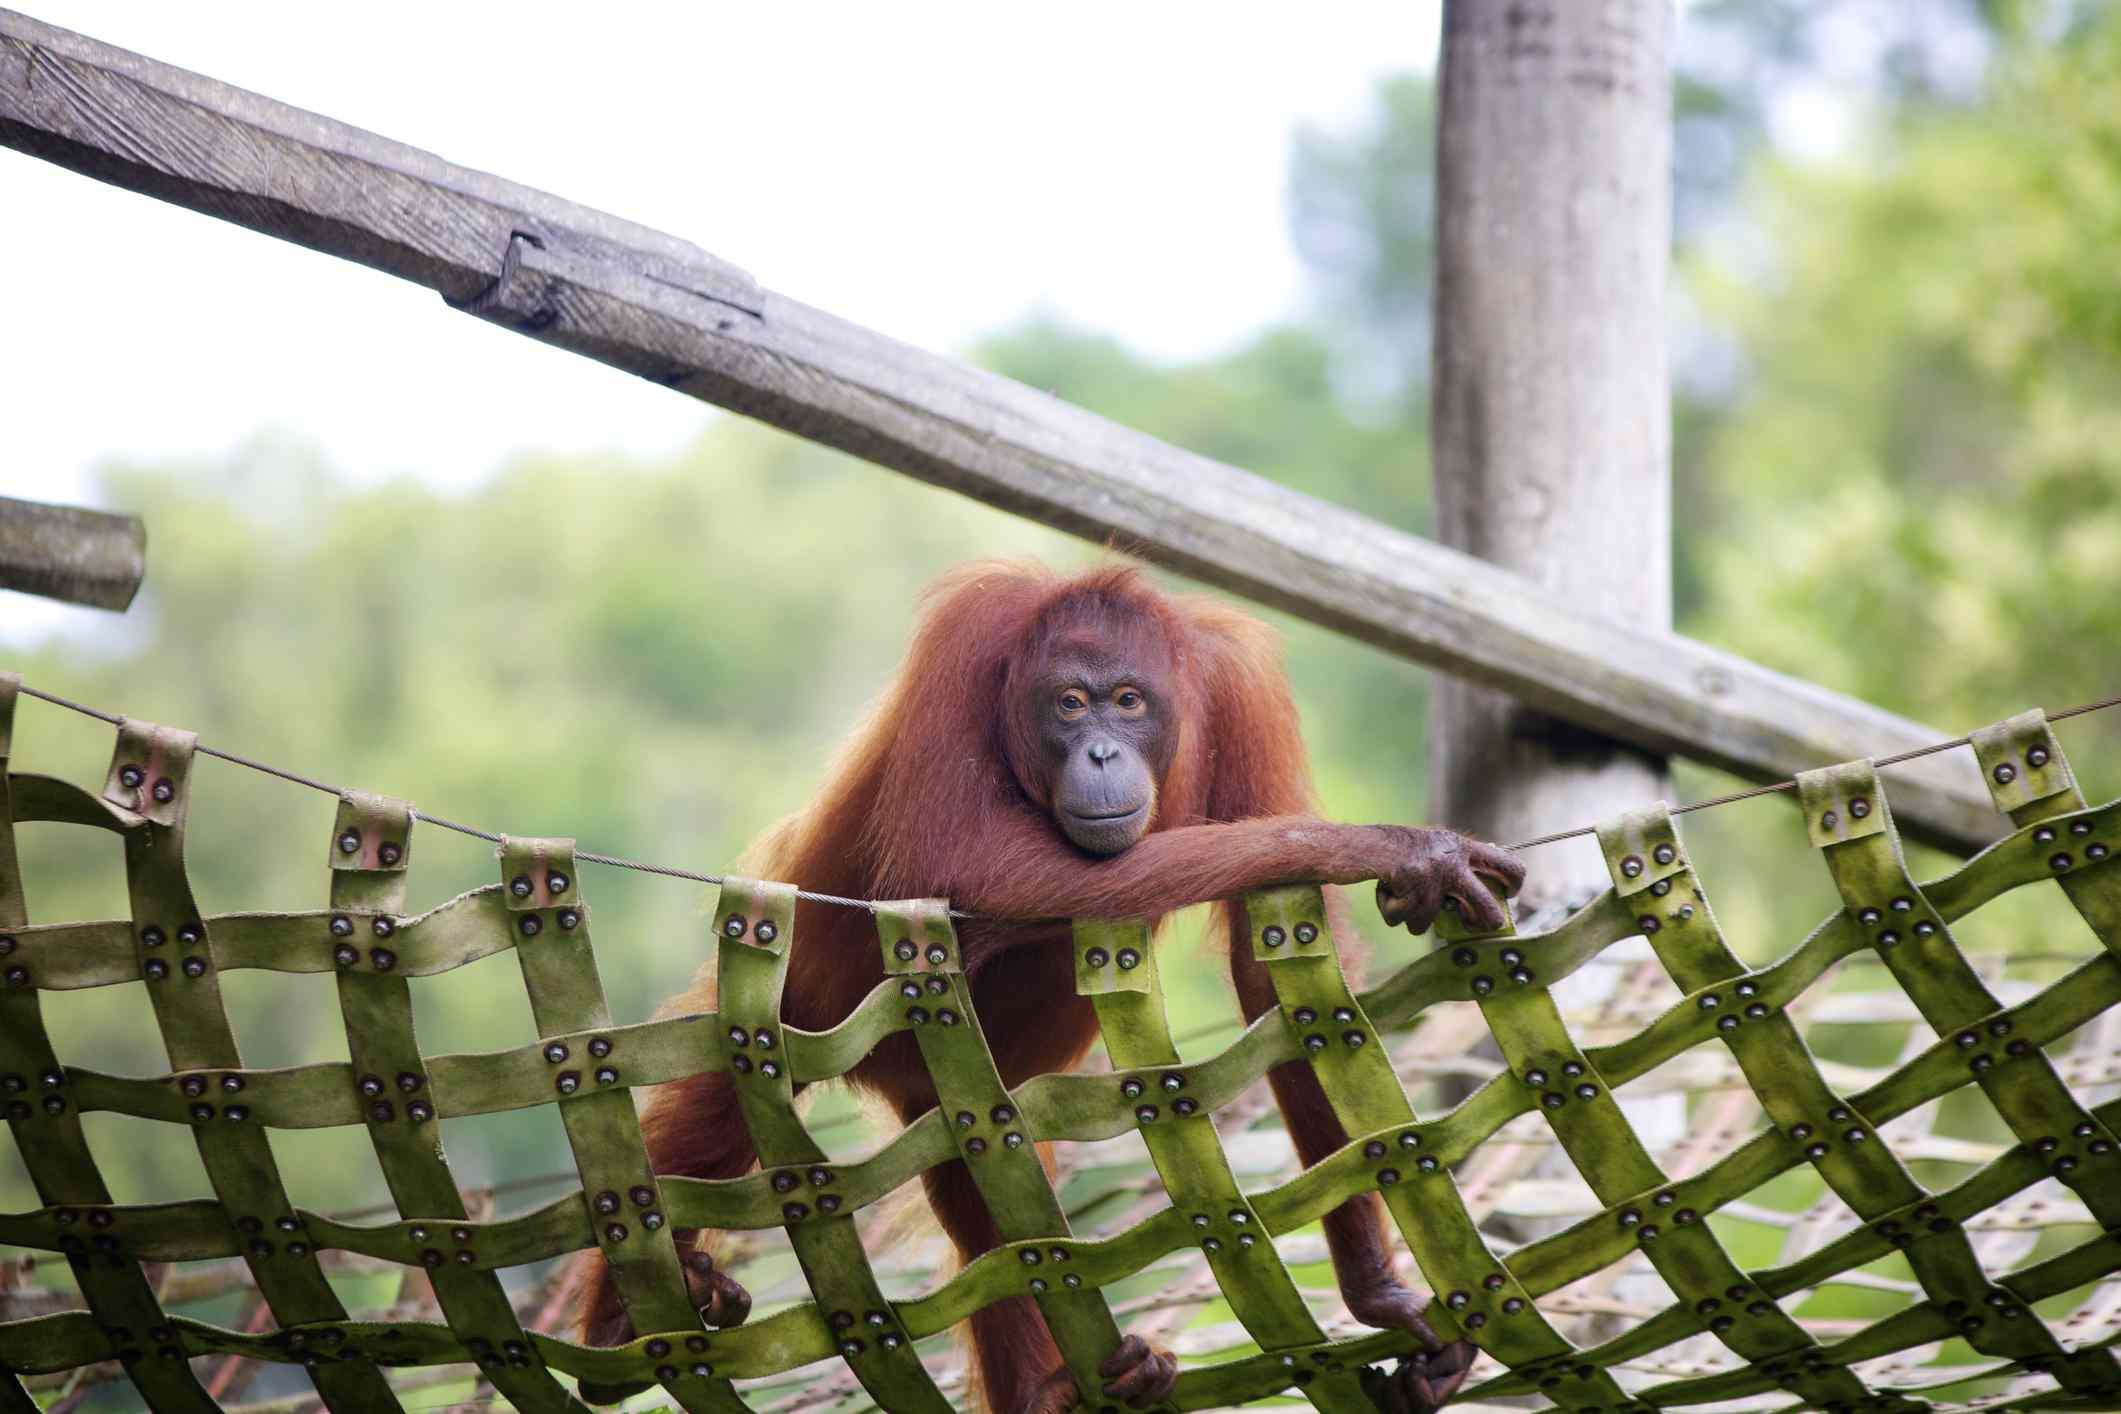 Endangered Orangutan on jungle gym, Kota Kinabalu, Lok Kawi Wildlife Park